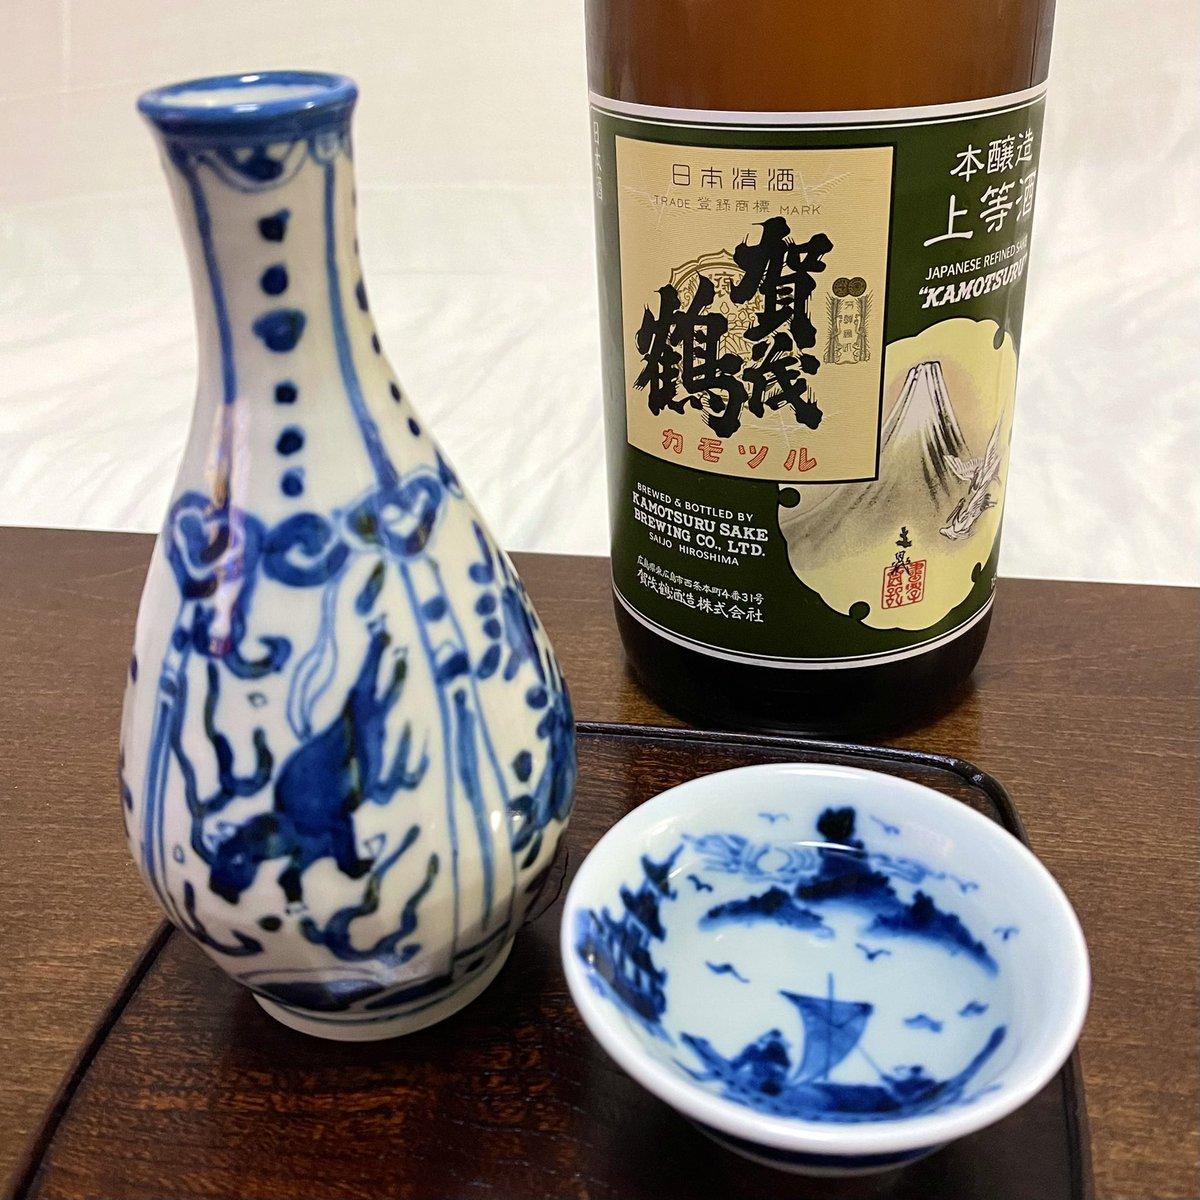 test ツイッターメディア - おでんの供に、広島「賀茂鶴・上等酒」燗酒。市中で簡単に見つかり、求めやすい酒のなかでは、一番好きな味の酒。安心して二合をじゃぶりと燗つける。「超特選特等酒」は、家では少々きらびやか過ぎるので、「上等酒」のほんのりリッチな味が良い。これの後に「山形正宗」や山陰の酒に行くのが定番だ。 https://t.co/yJMAEg2ngO